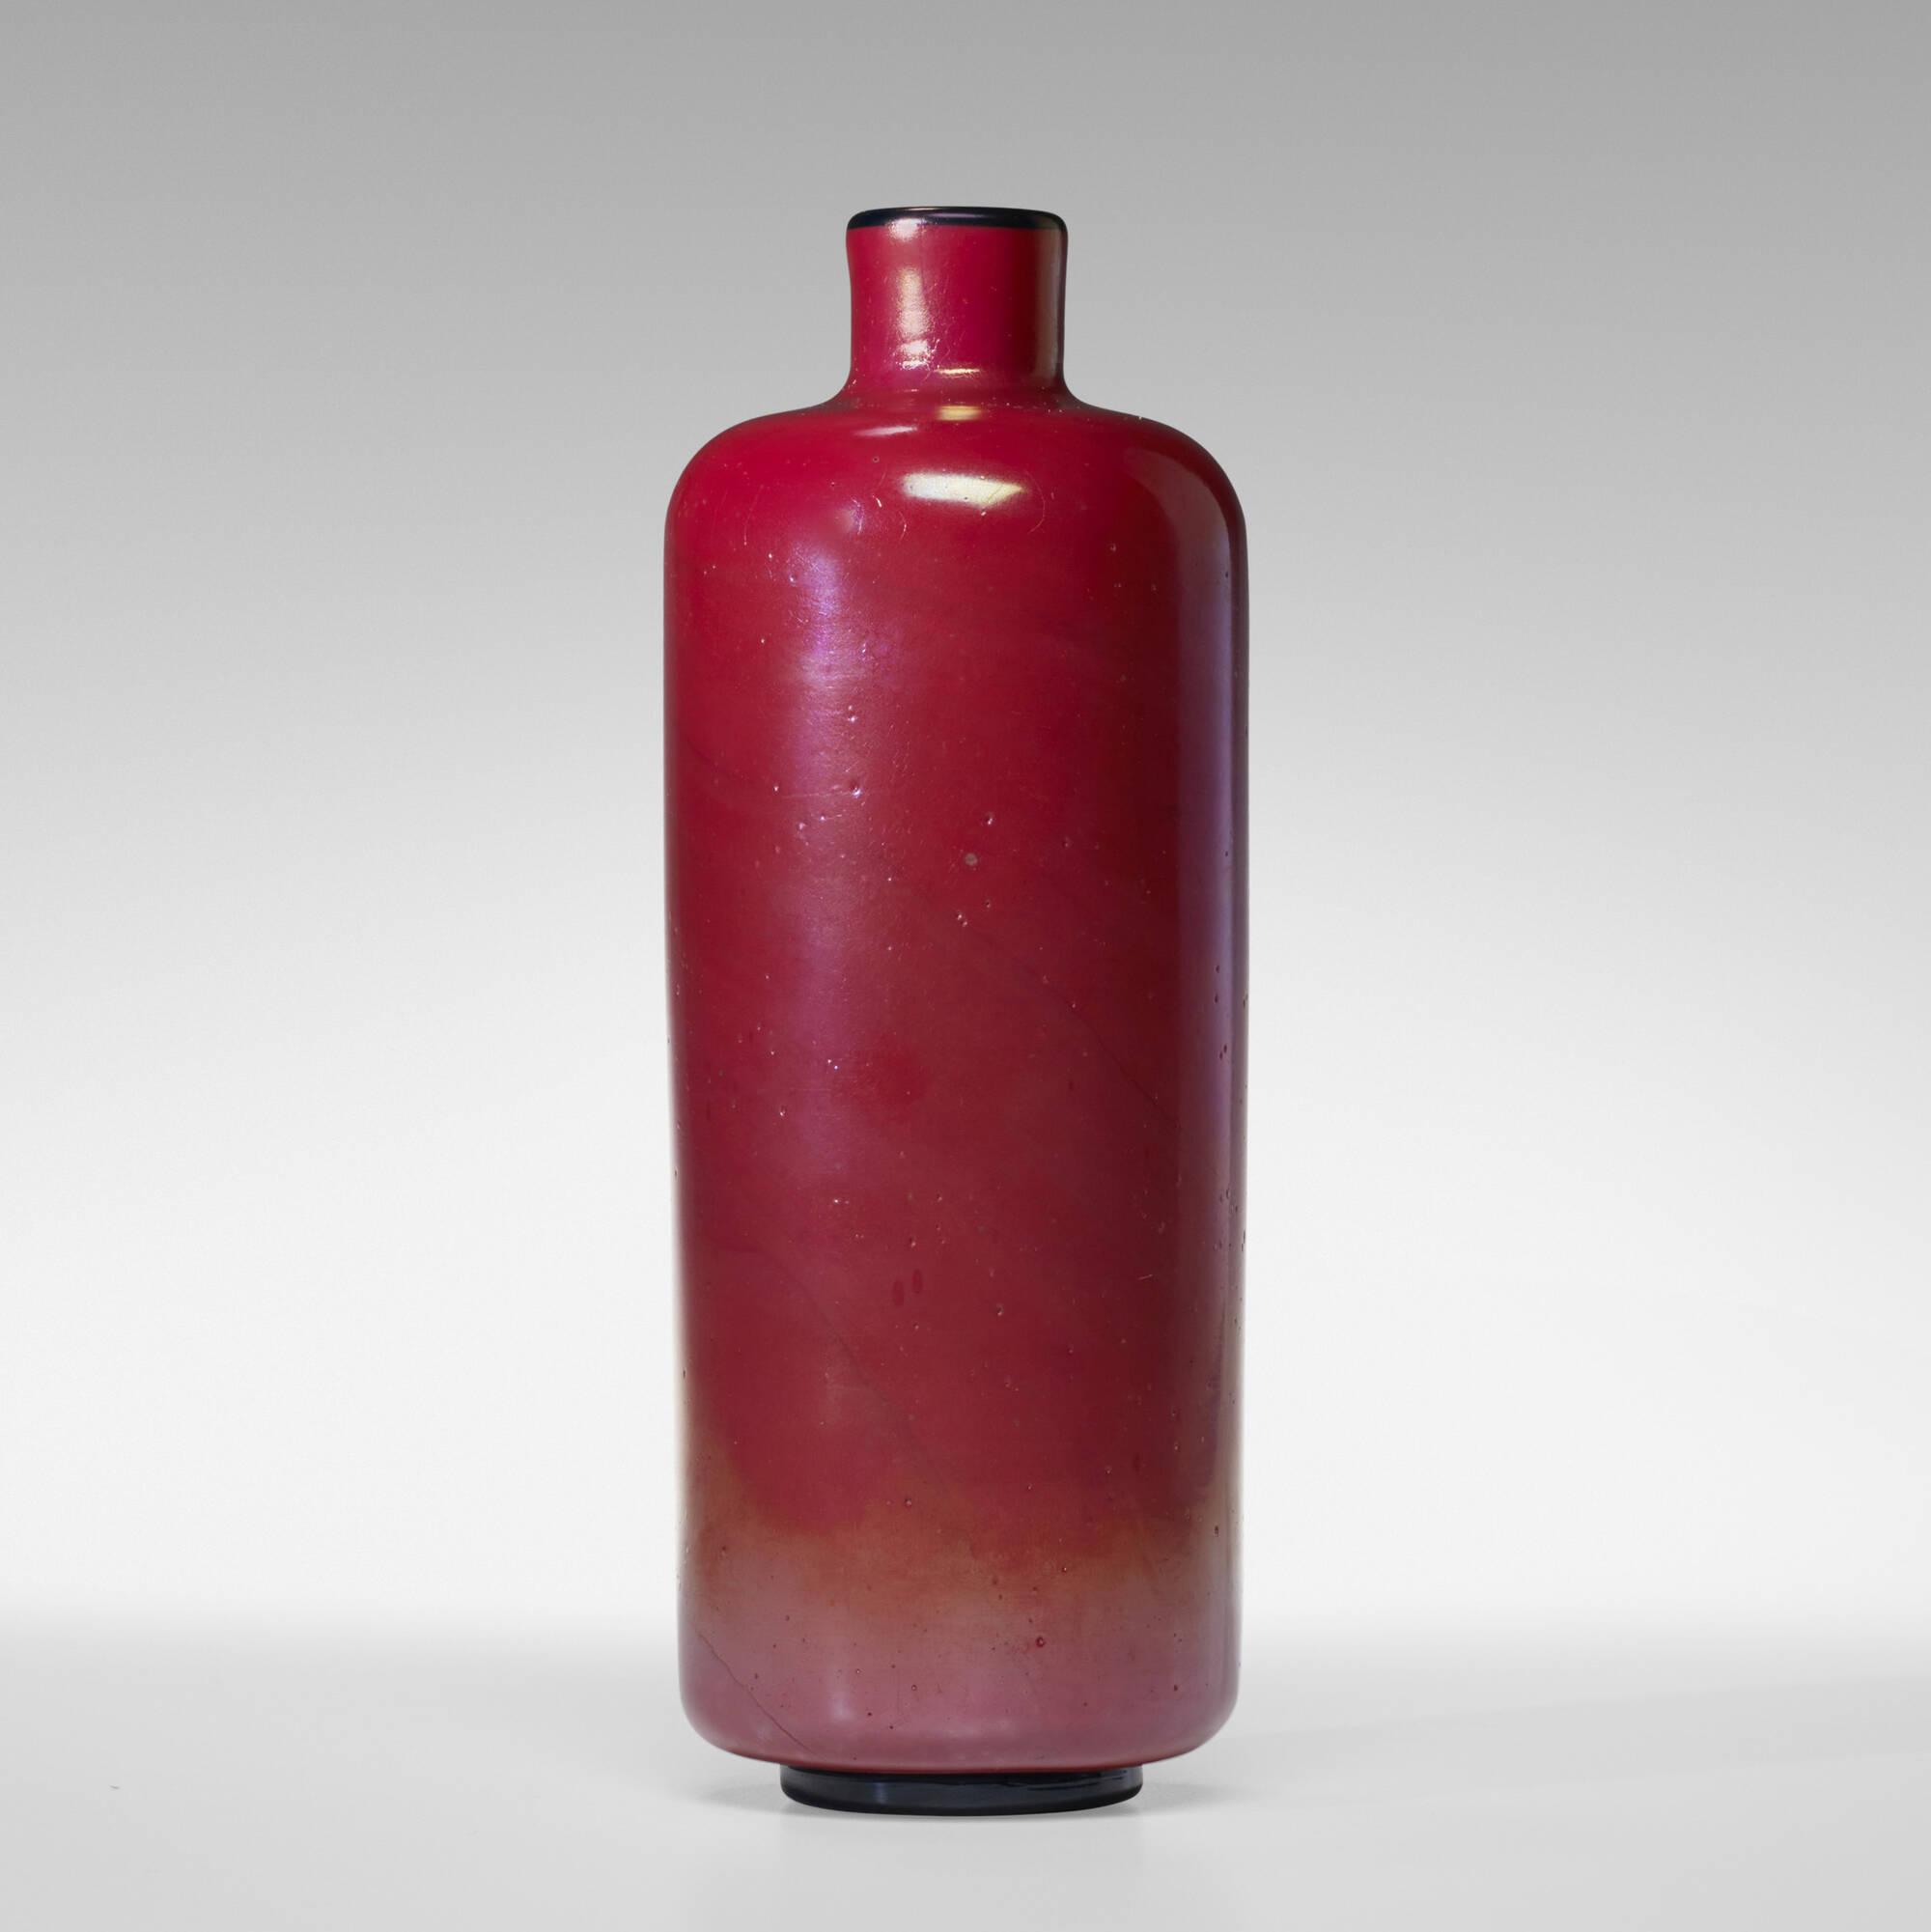 140 carlo scarpa vase important italian glass 20 may 2014 140 carlo scarpa vase 1 of 1 floridaeventfo Image collections